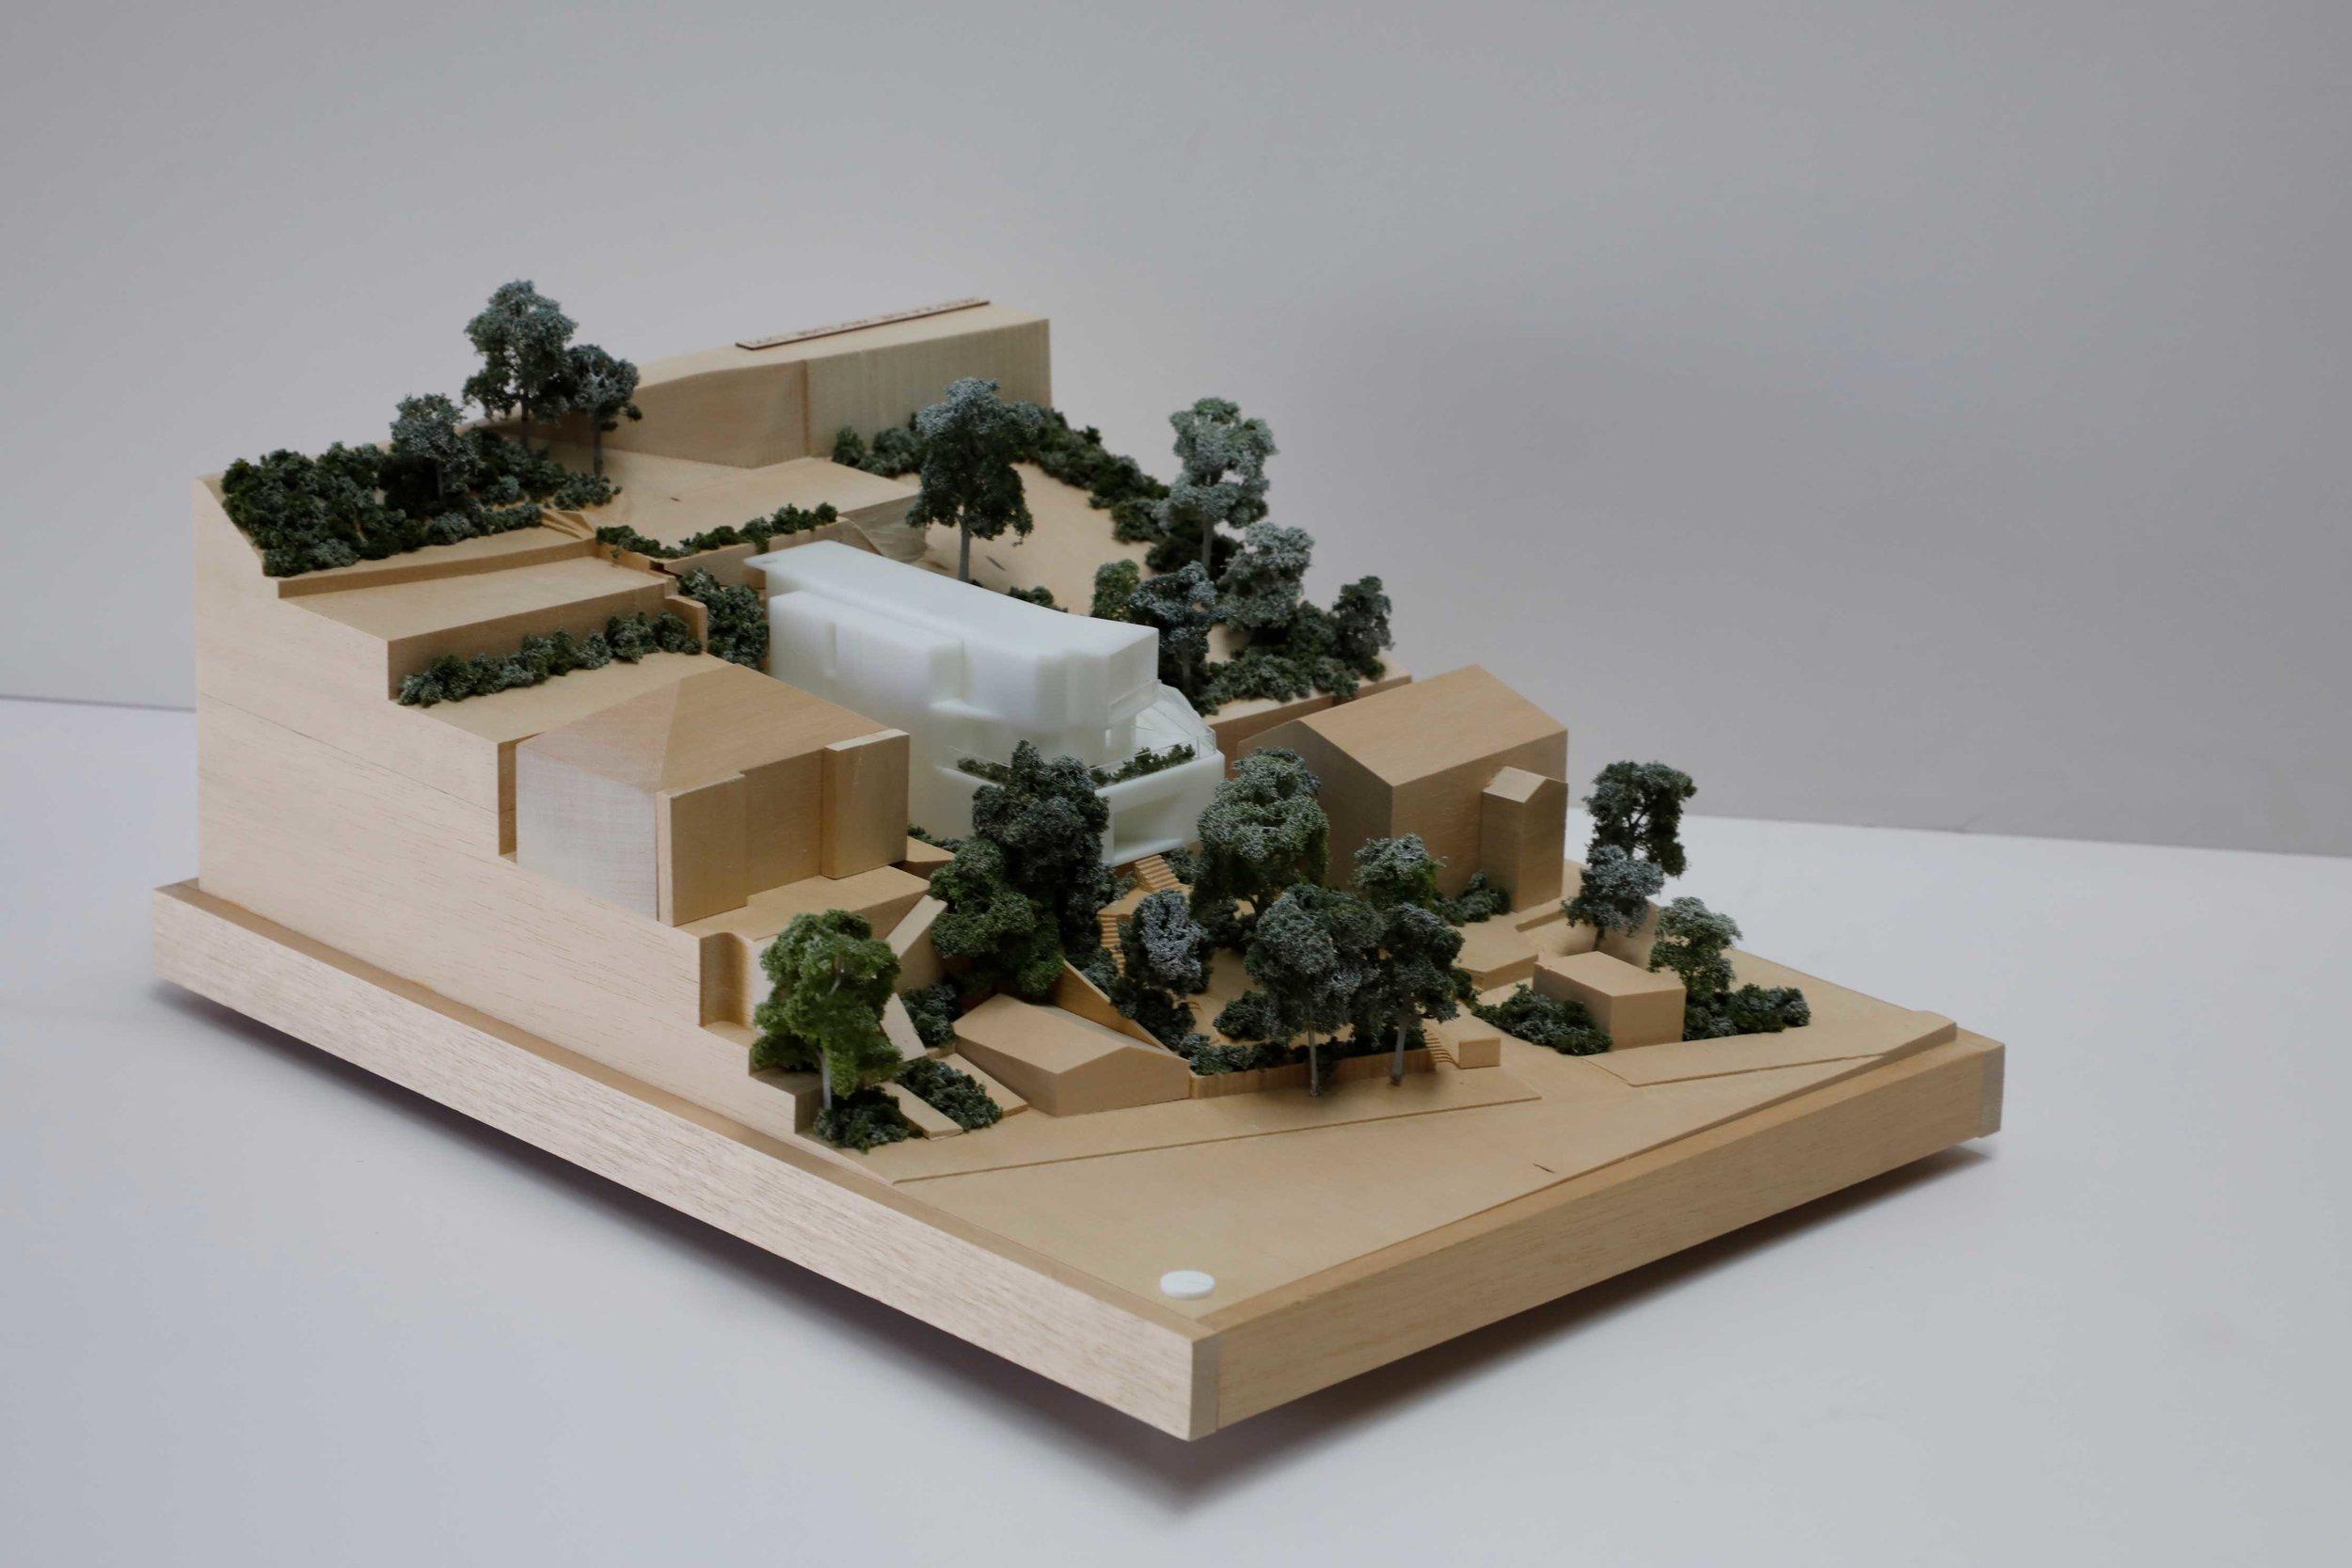 da_MODEL_CNC_architecture_timber_make_models_fabrication_sydney_Tribe_2.jpg